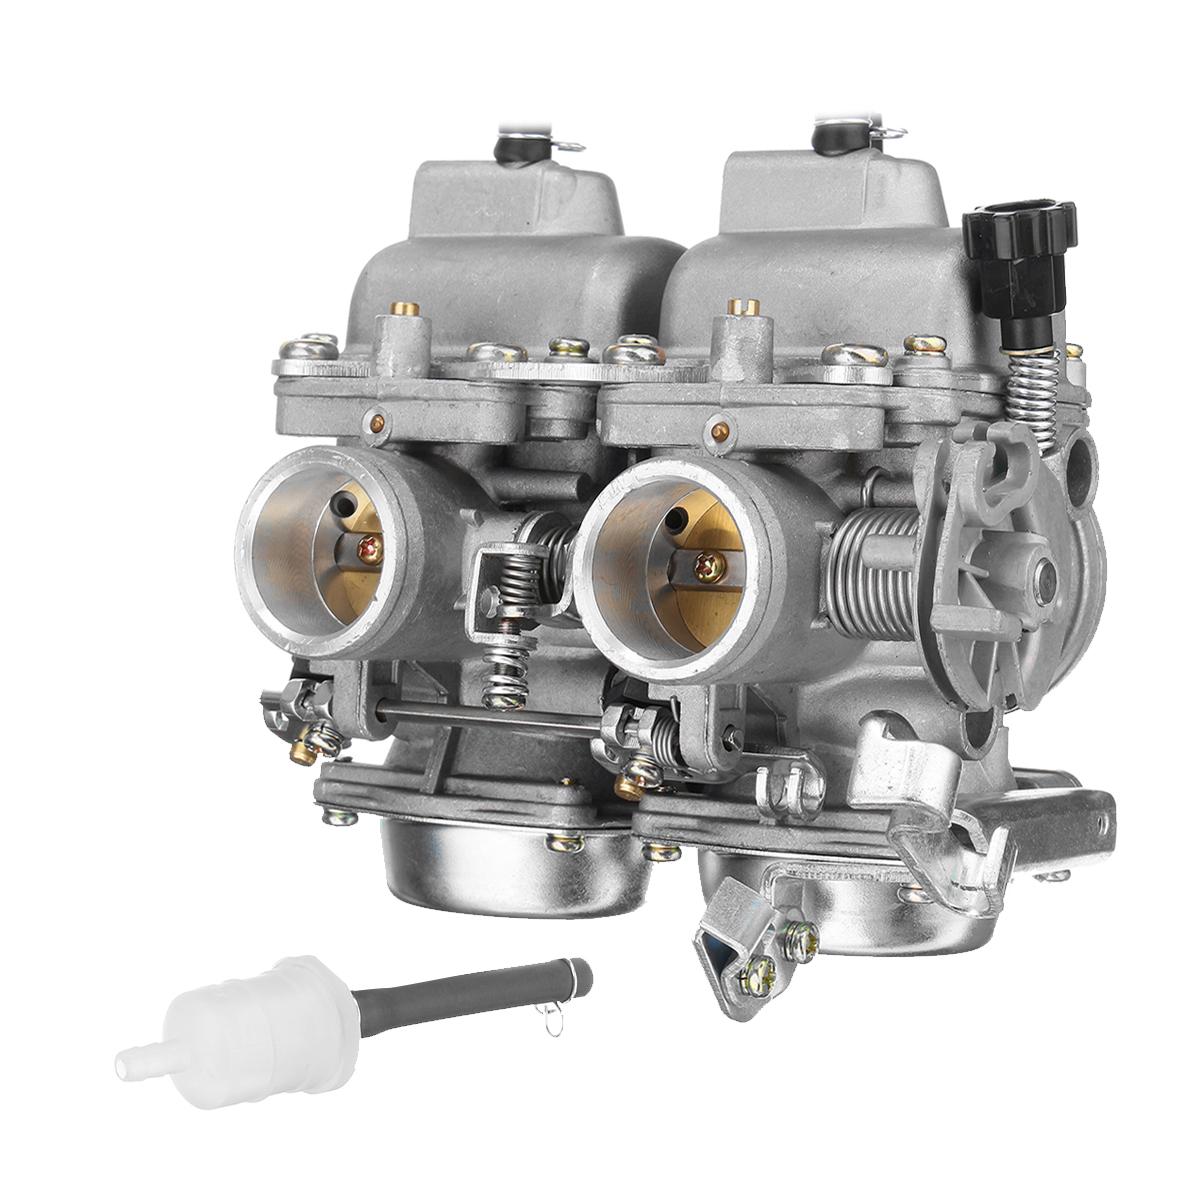 hight resolution of carburetor dual carb assy fuel filter for honda rebel ca cmx 250 c cmx250 ca250